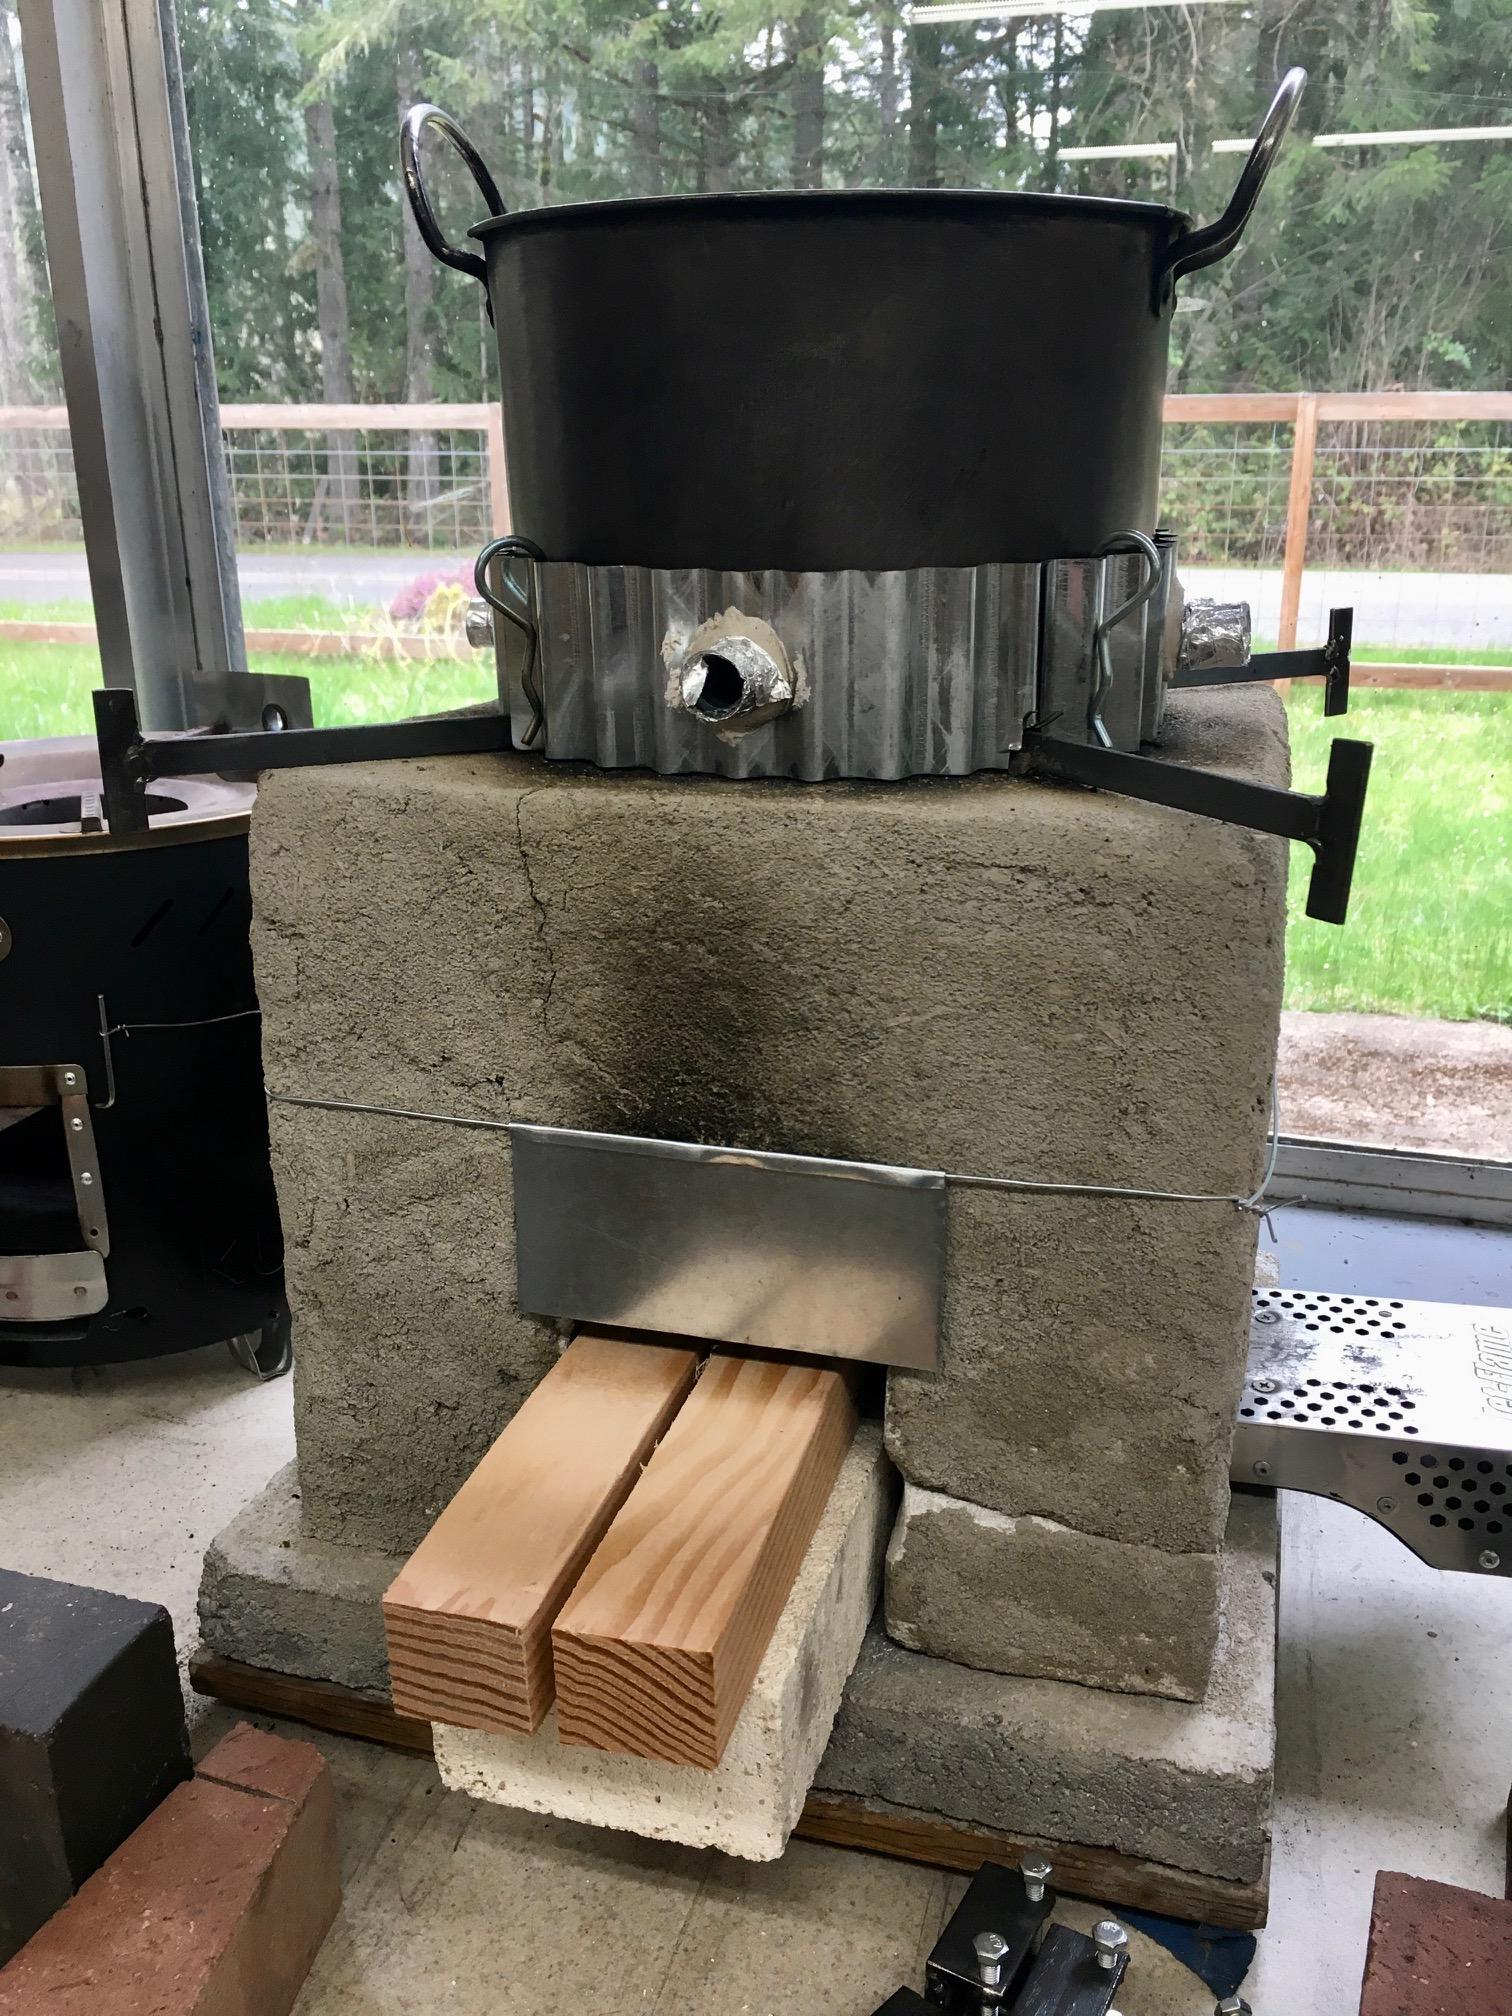 CQC stove with swinging door